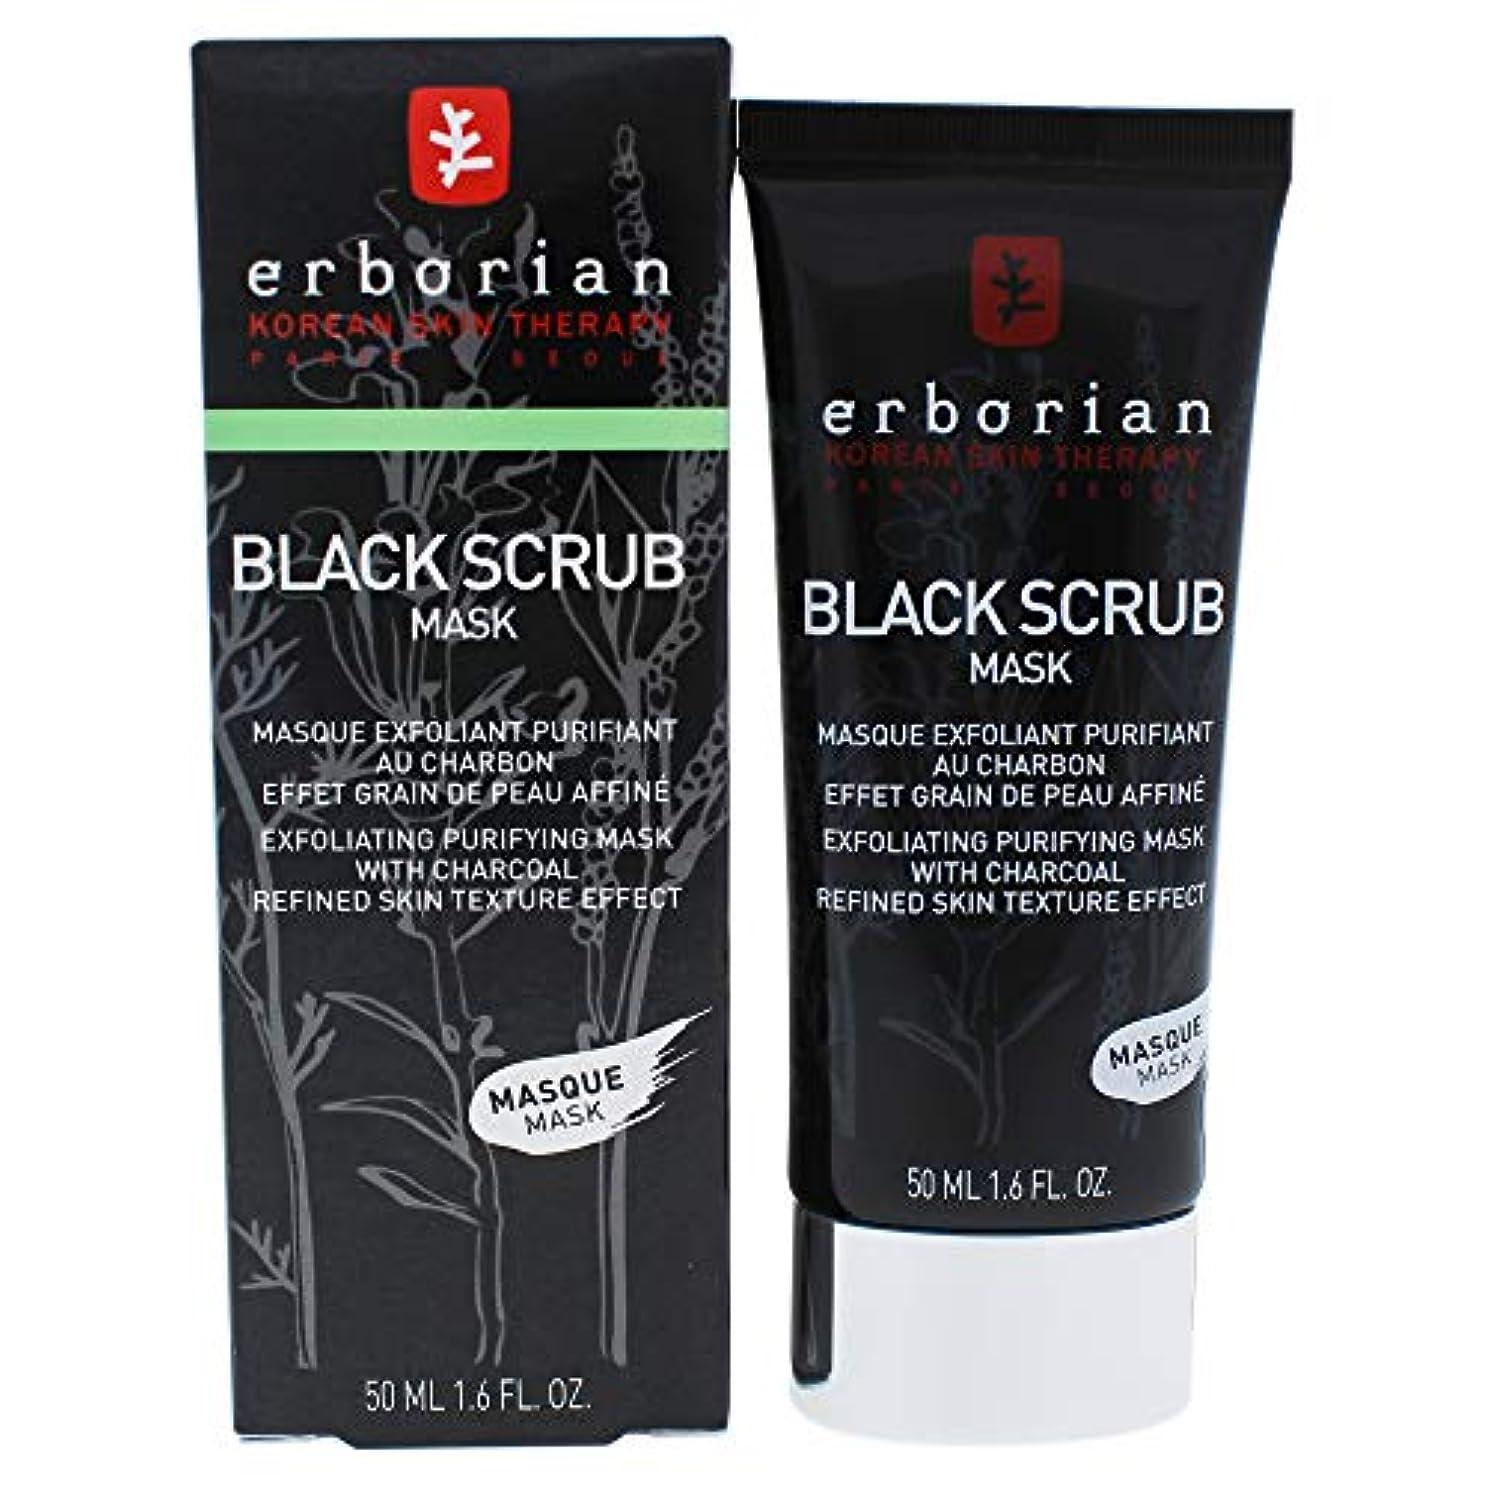 謙虚パーセント過言Erborian Black Scrub 50ml [並行輸入品]